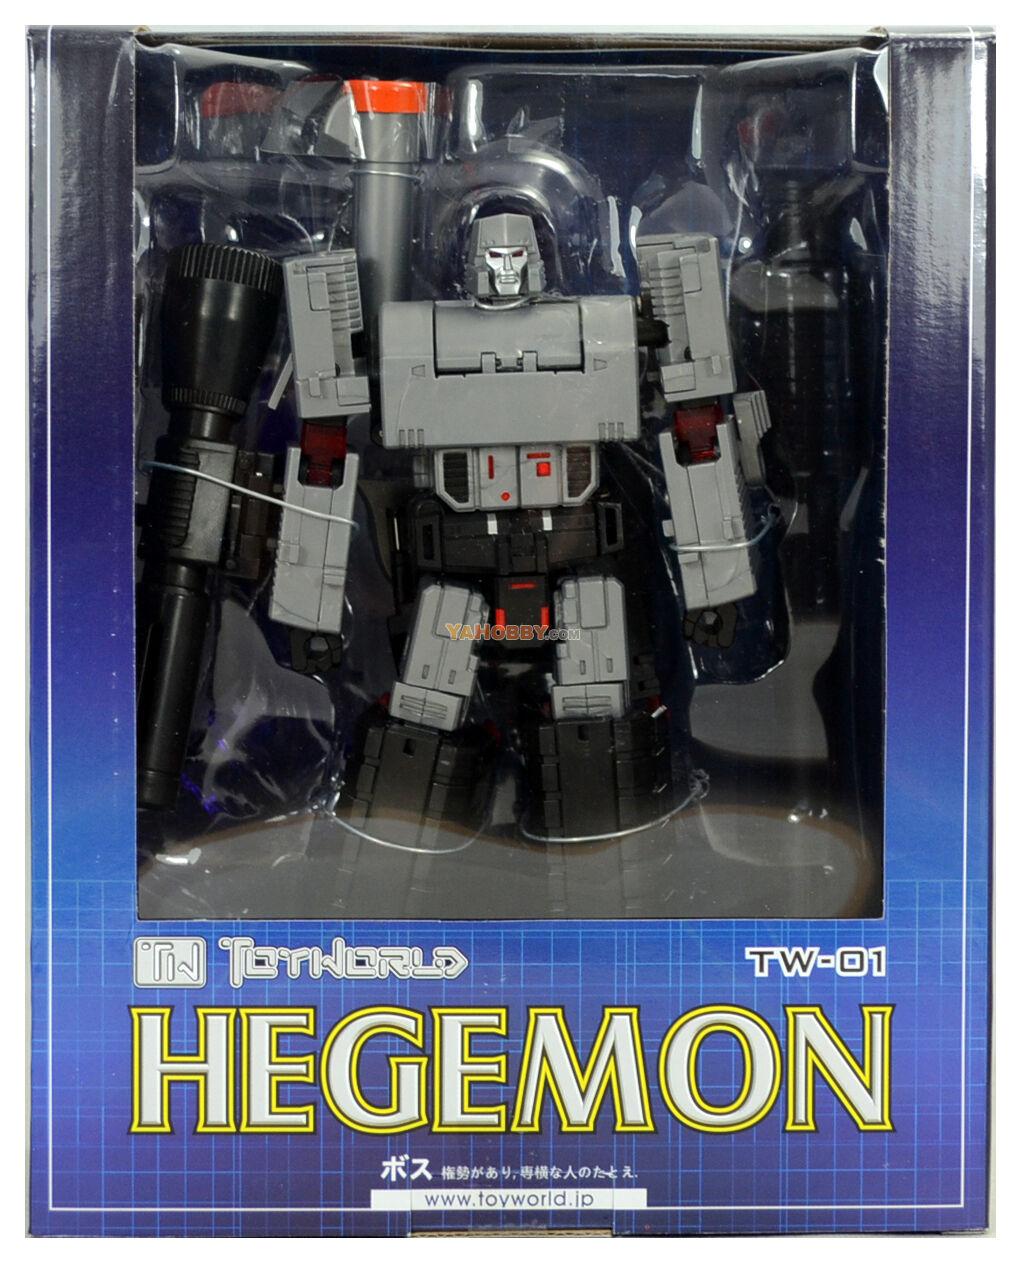 Toyworld TW-01 HEGEMON  Transformers MEGATRON G1 Decepticon MP SEALED misb